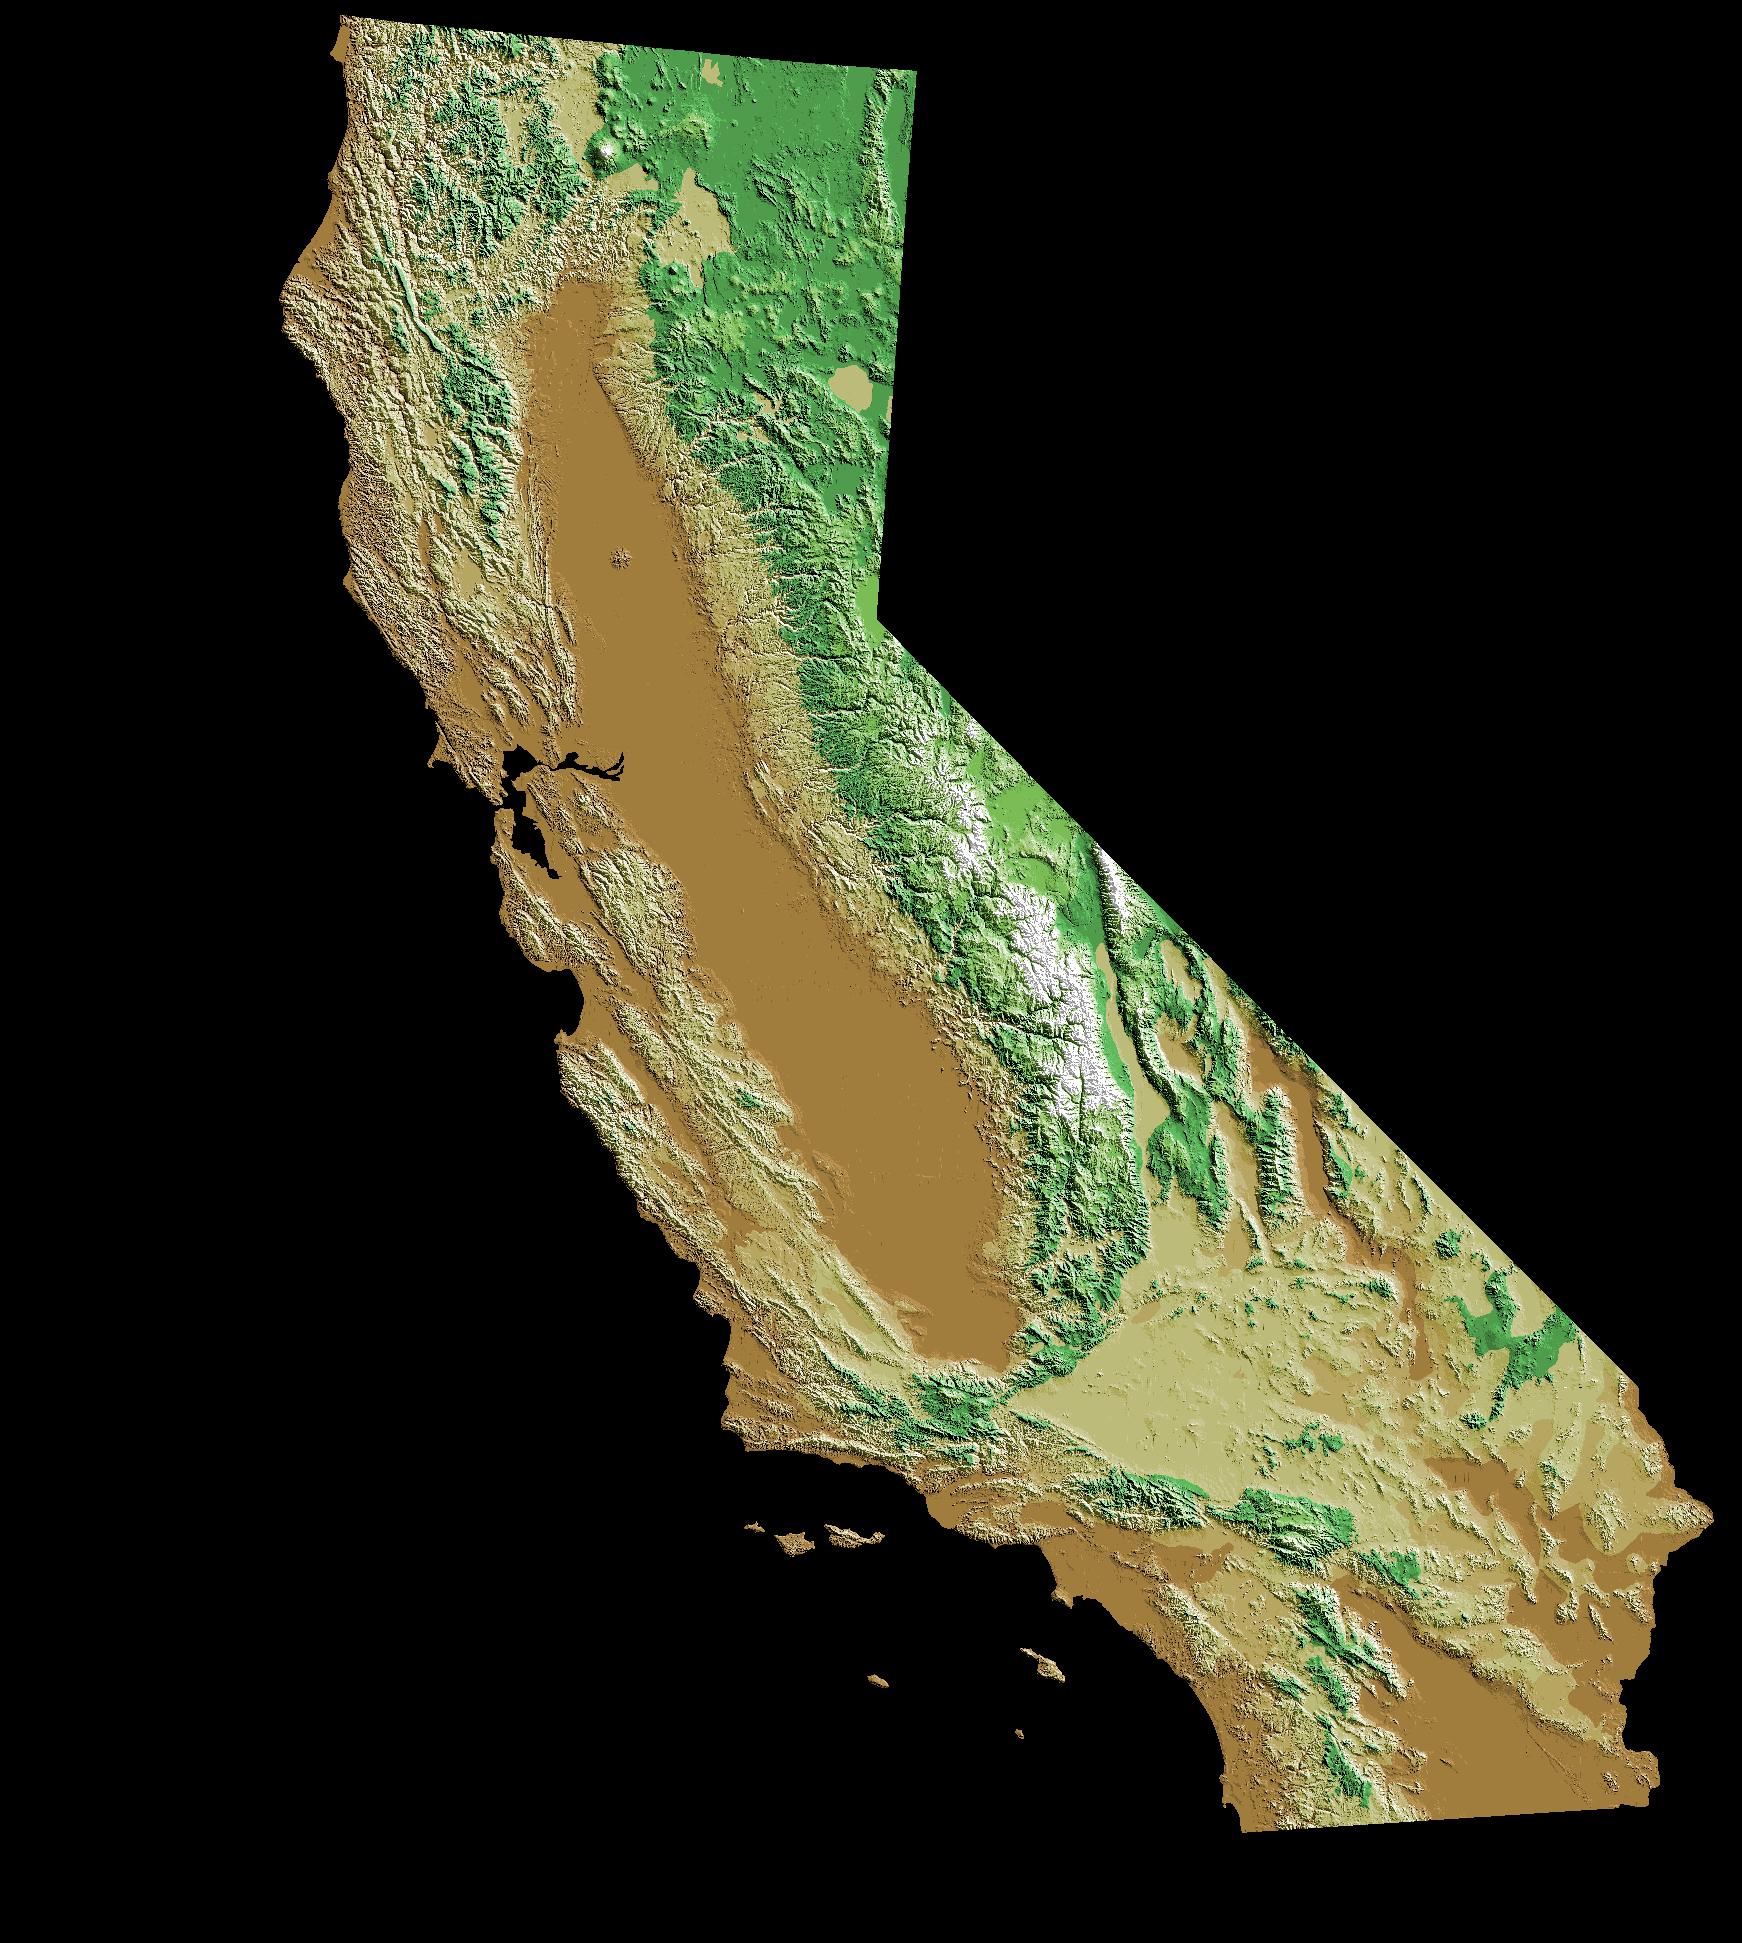 Elevation Map Of California, Usa - Mapsroom | Mapsroom - California Topographic Map Elevations